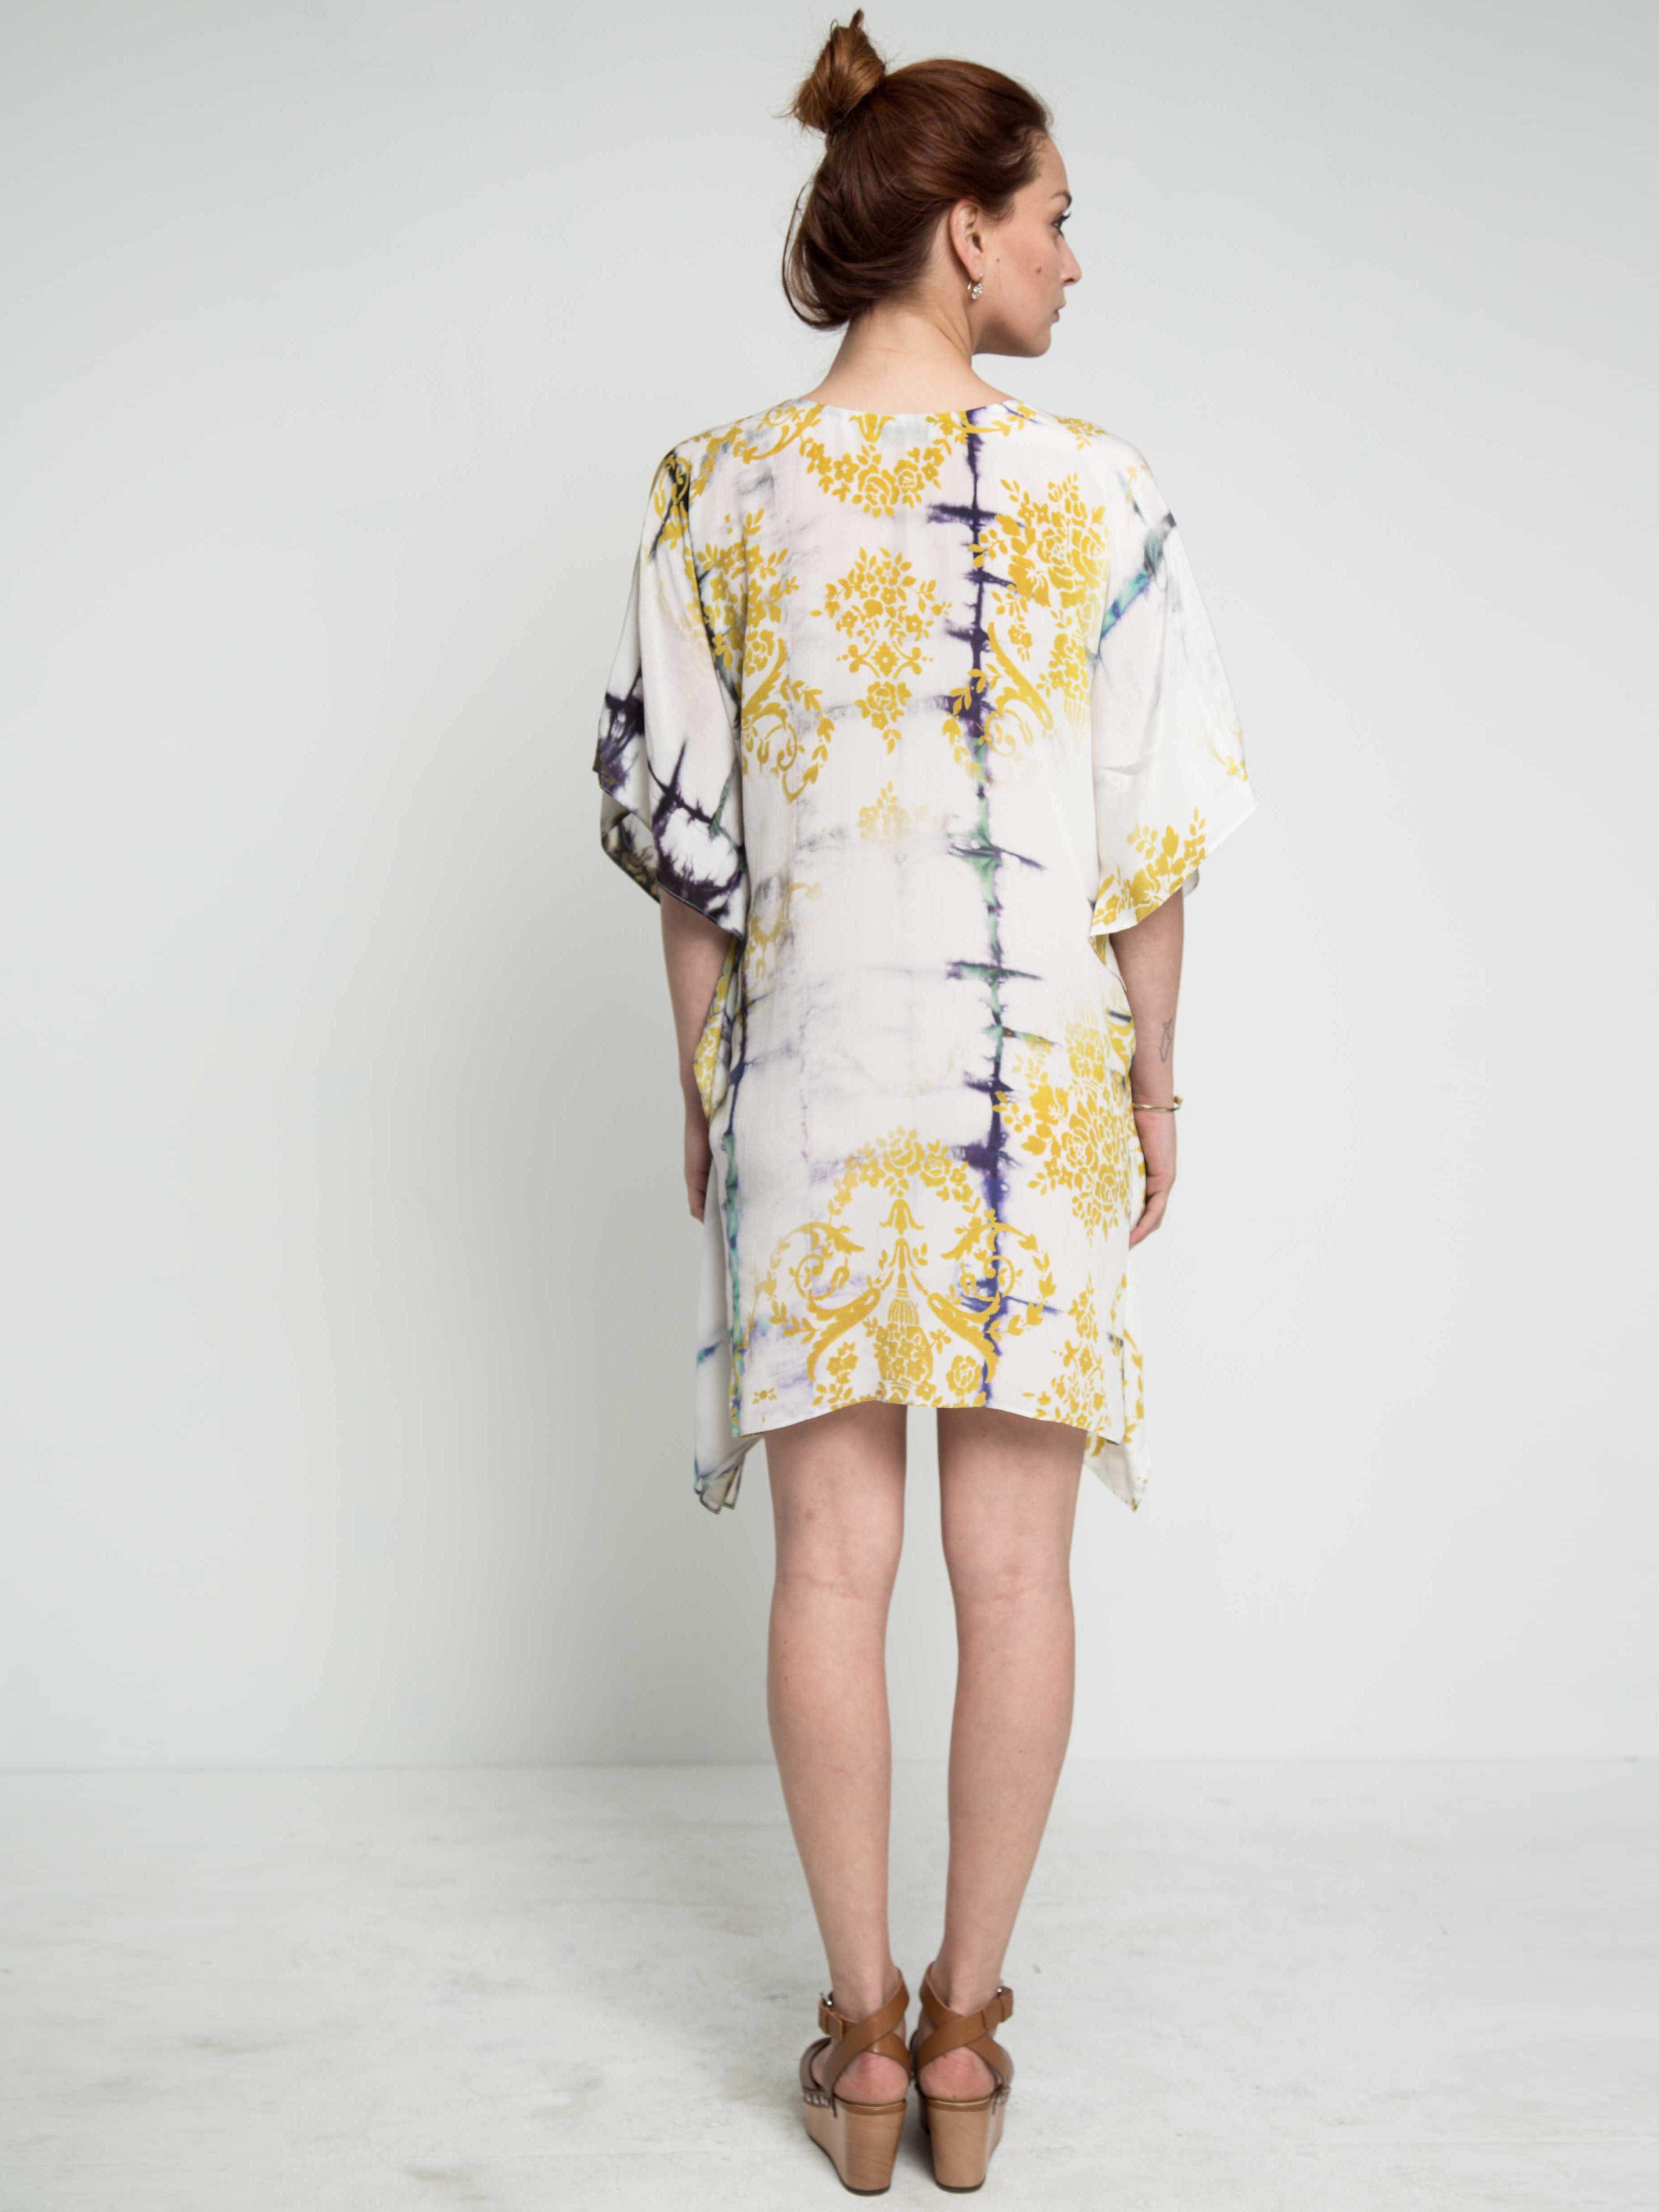 caftan-dressatbarneysny-dressatsaksfifthavenue-dressonsale-madeinusa-hotsellerdress-maati-giftformom-giftforteacher-holiday2016-handmade-madeinusa-designergifts